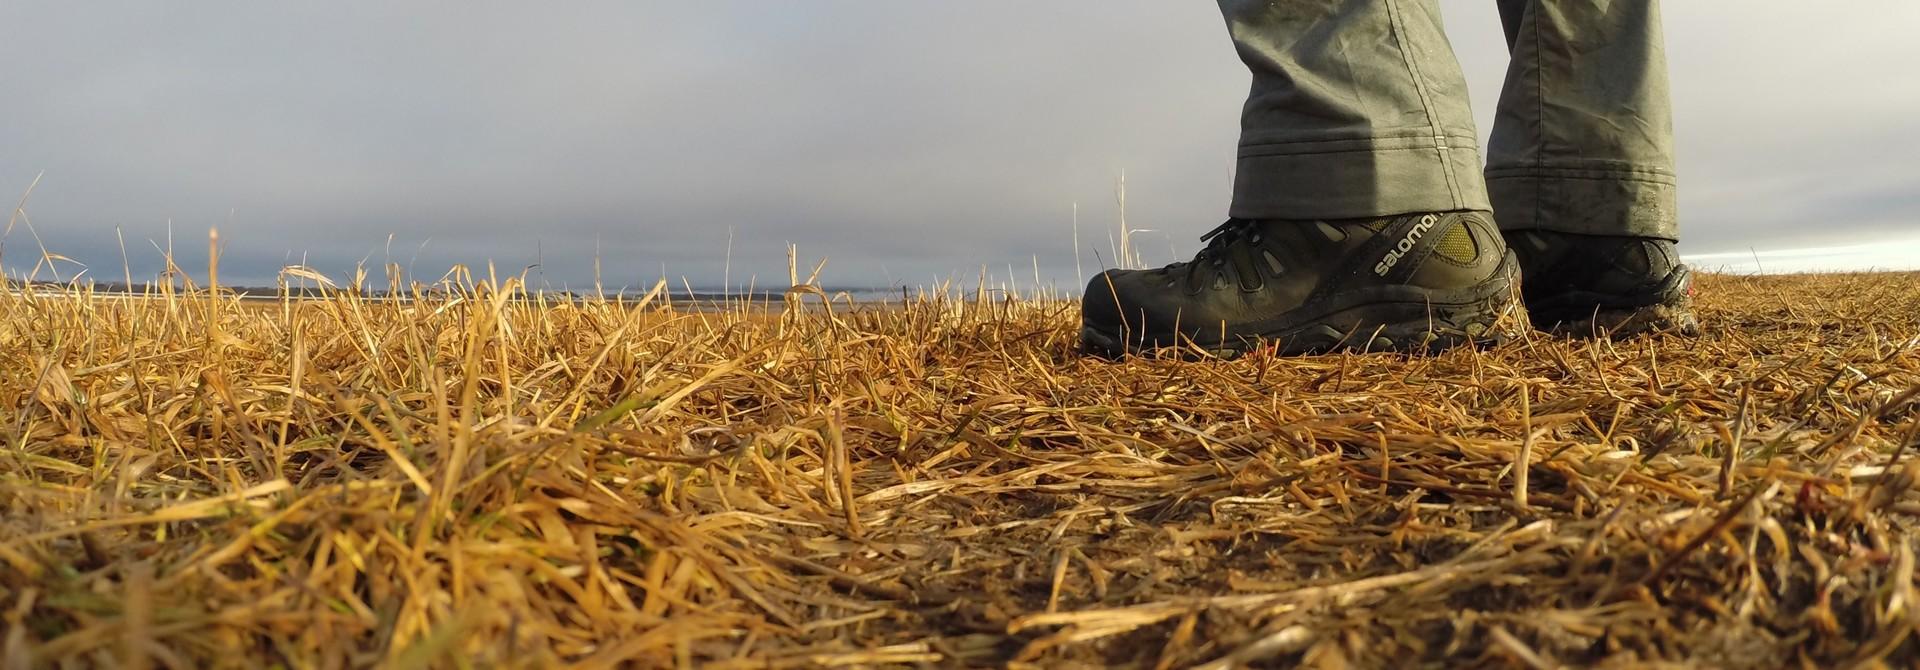 Men's Hiking Footwear